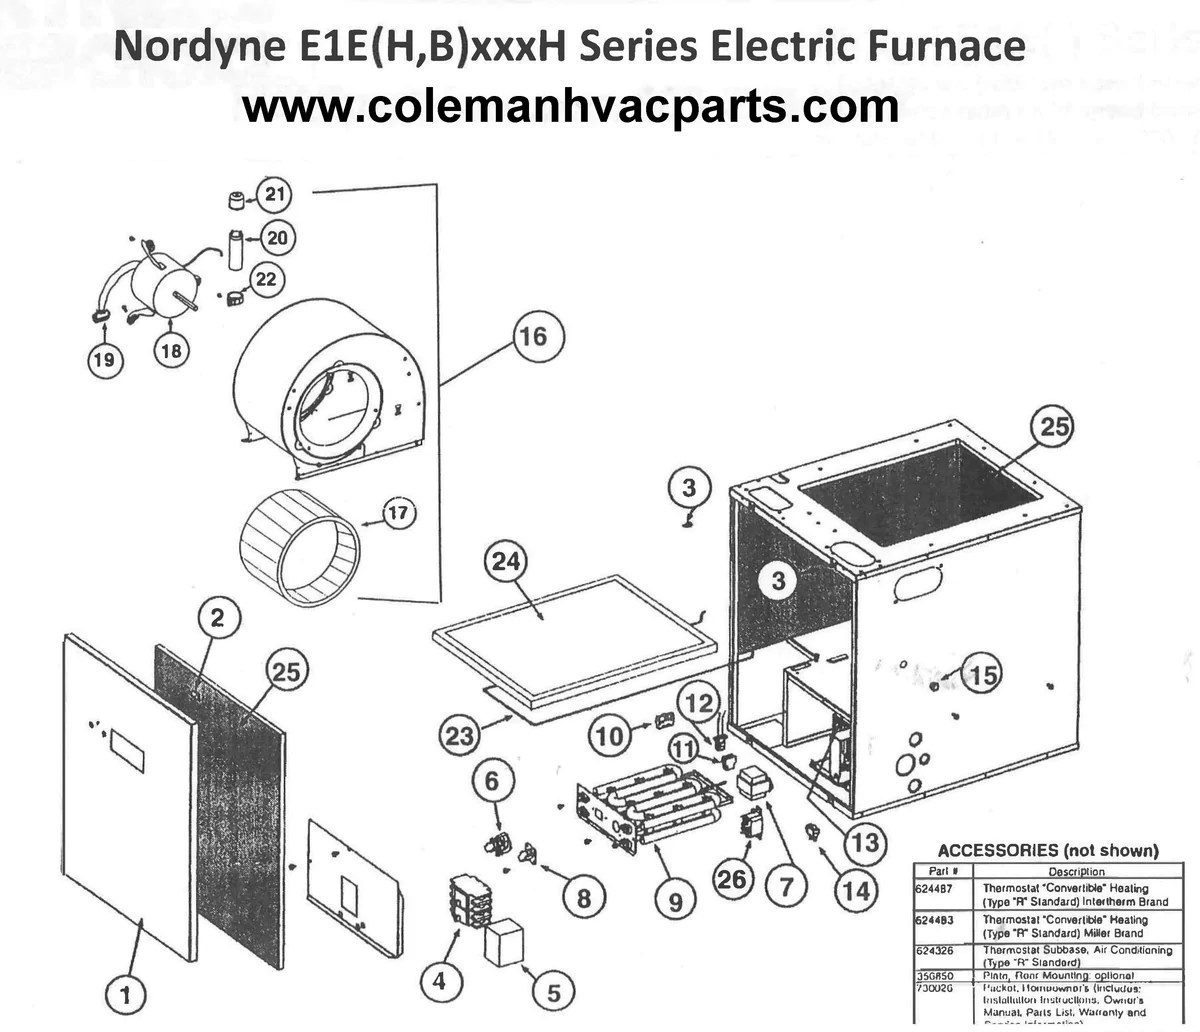 medium resolution of e1eh012h nordyne electric furnace parts hvacpartstore coleman furnace parts miller furnace parts diagram